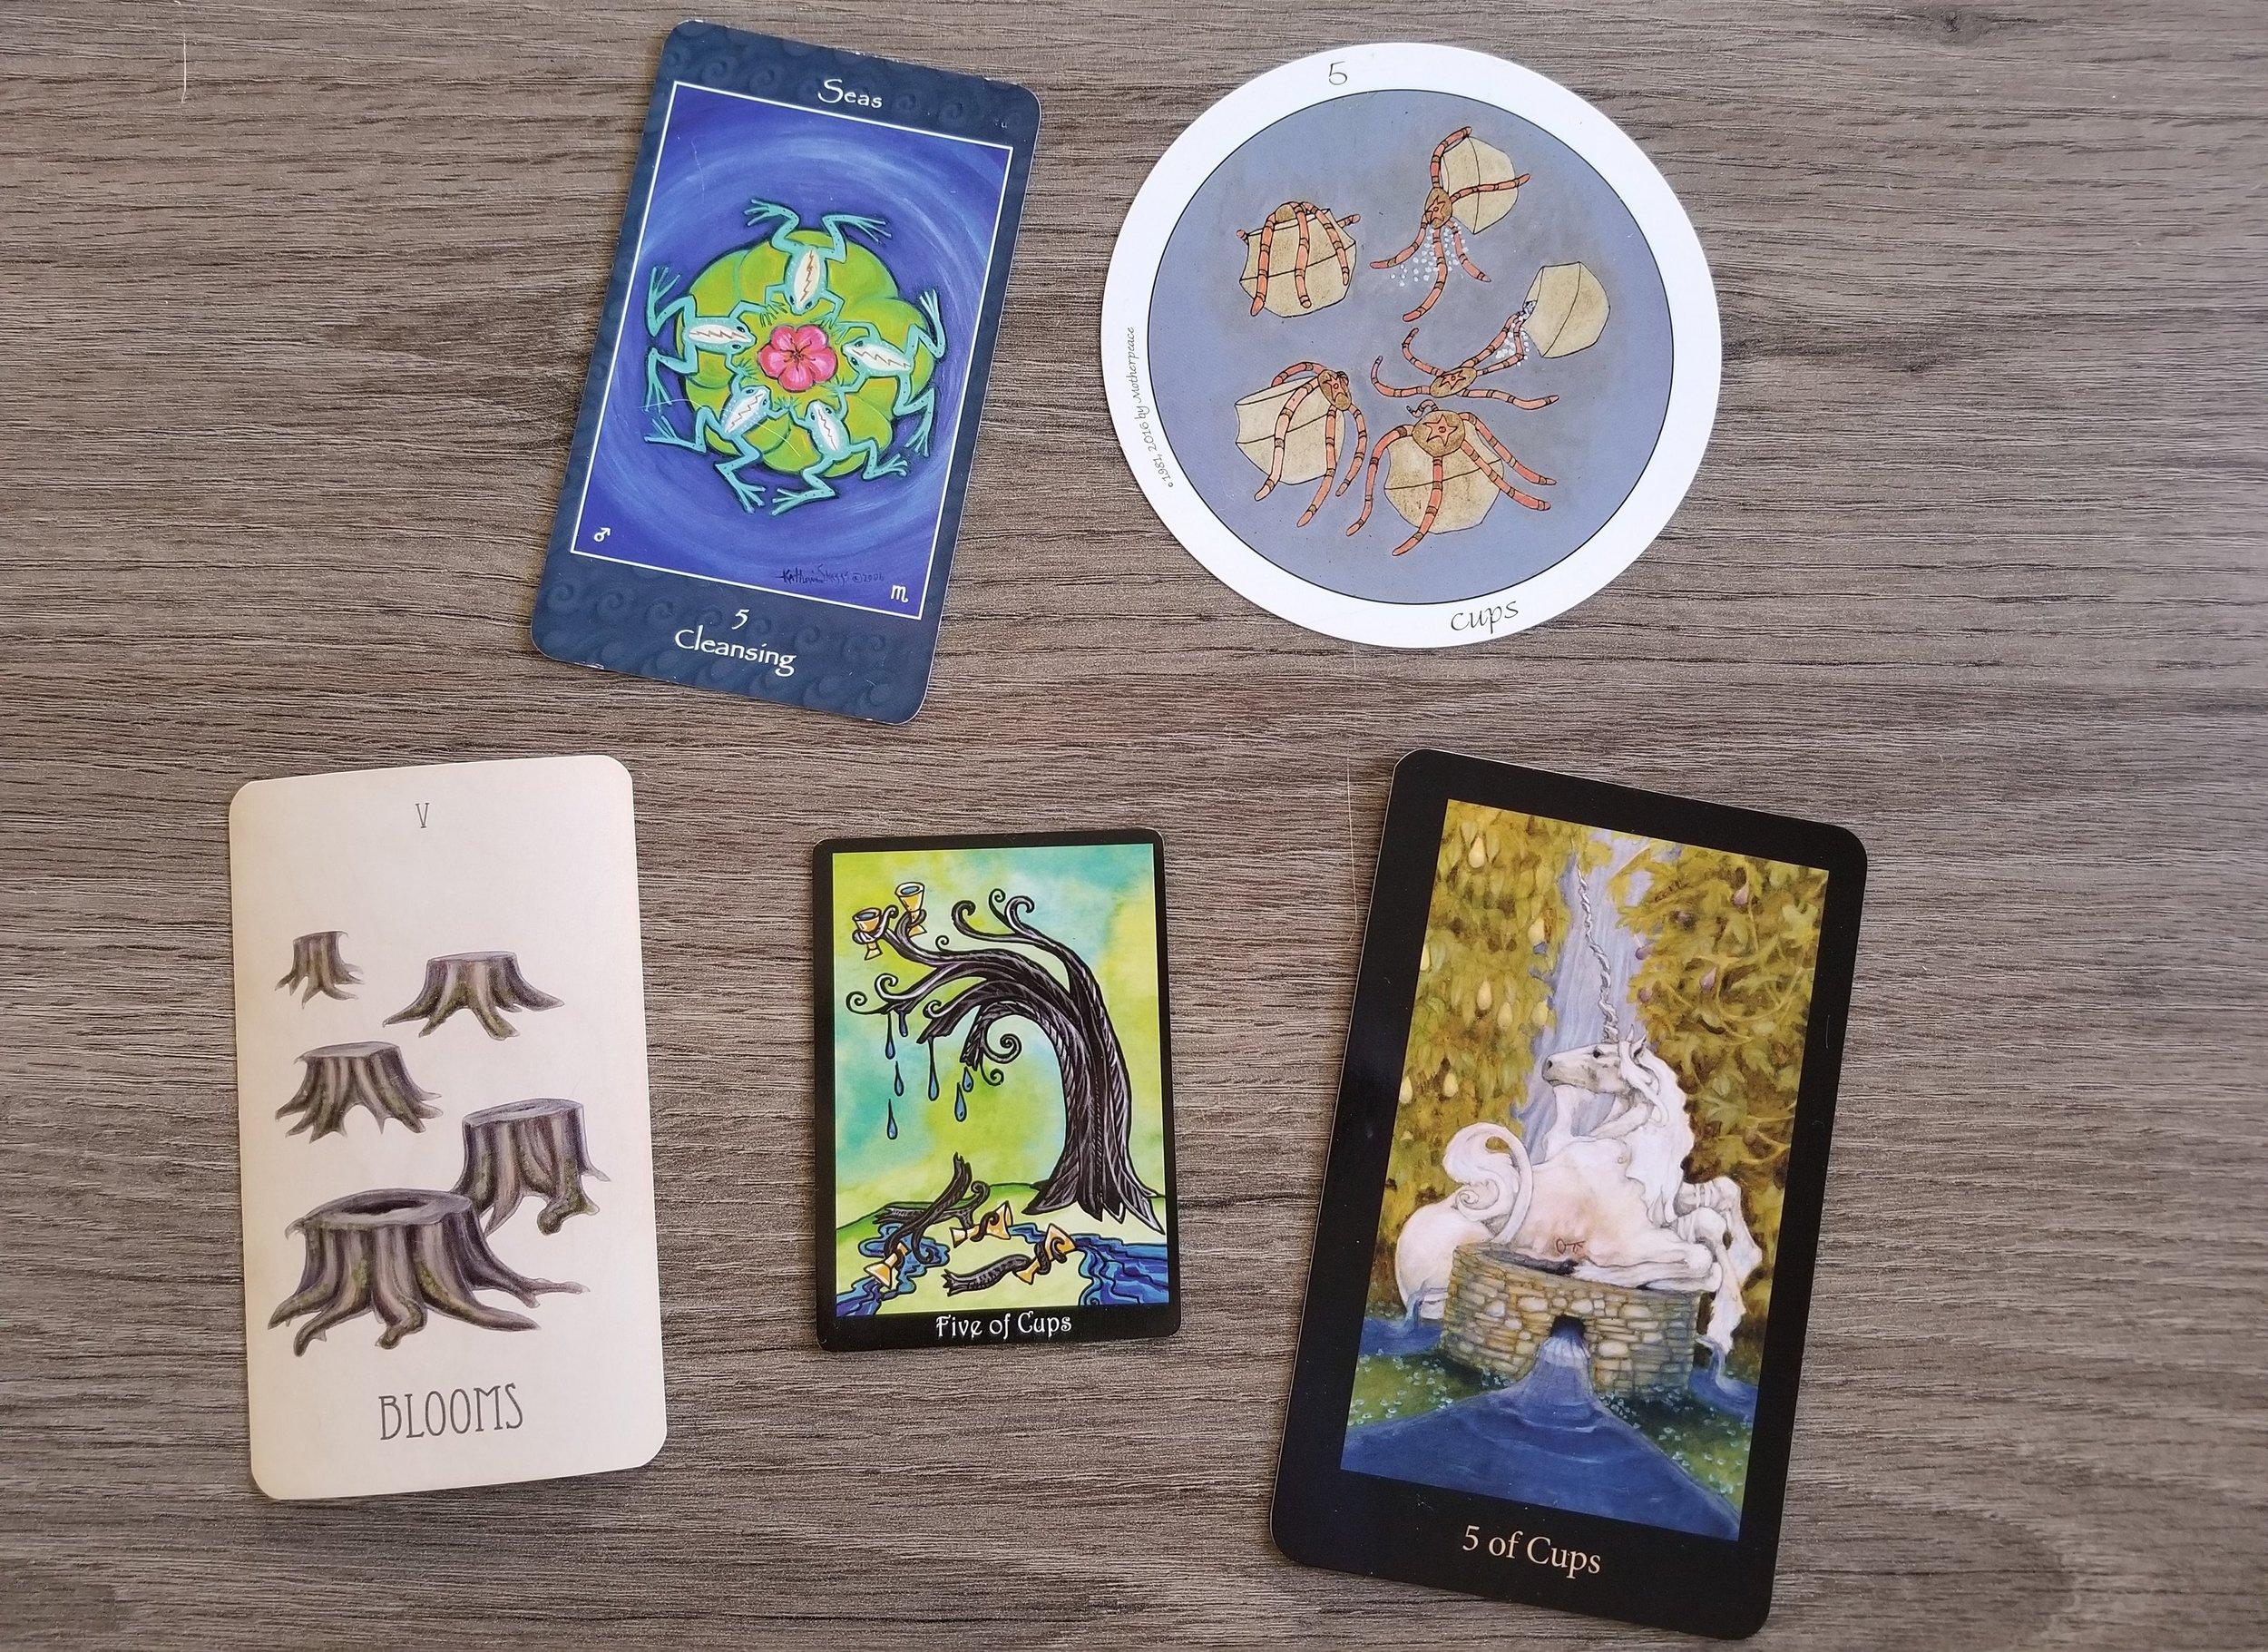 Five of Cups from the Mythical Goddess Tarot, Motherpeace Tarot, Wooden Tarot, Tarot of Trees, and Mary-El Tarot